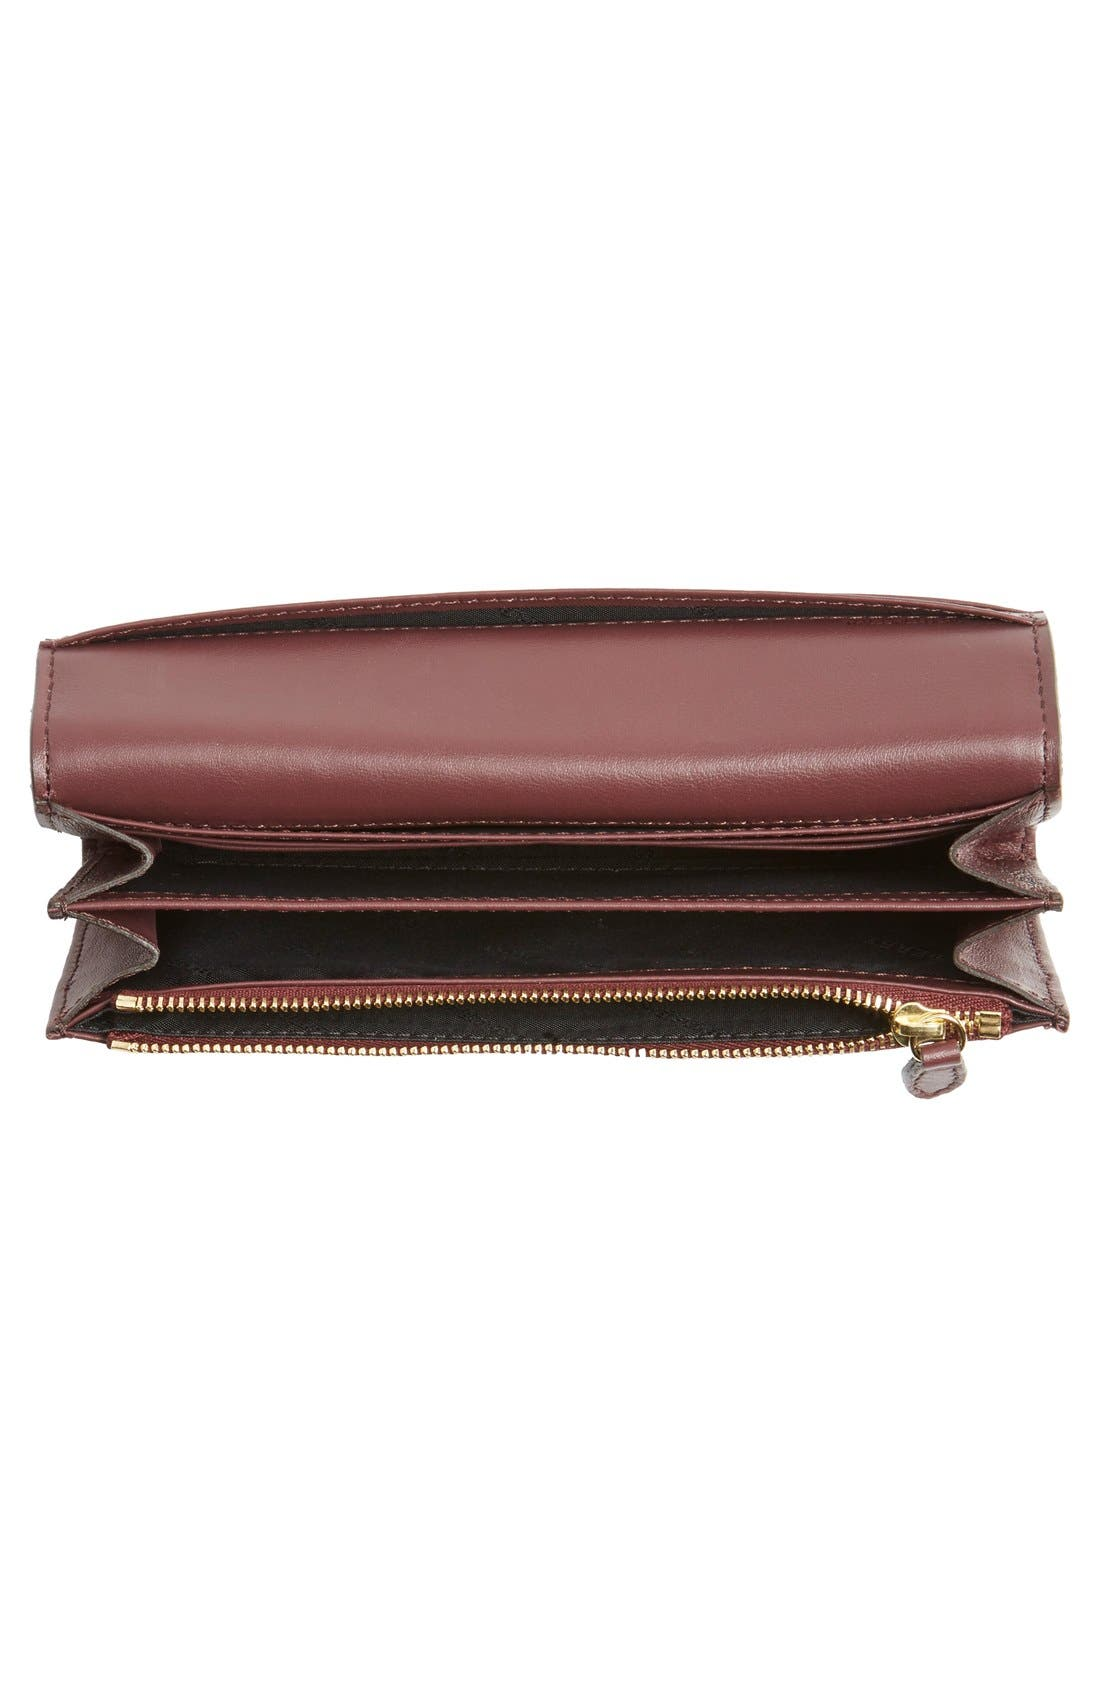 'Porter - Check' Continental Wallet,                             Alternate thumbnail 2, color,                             600